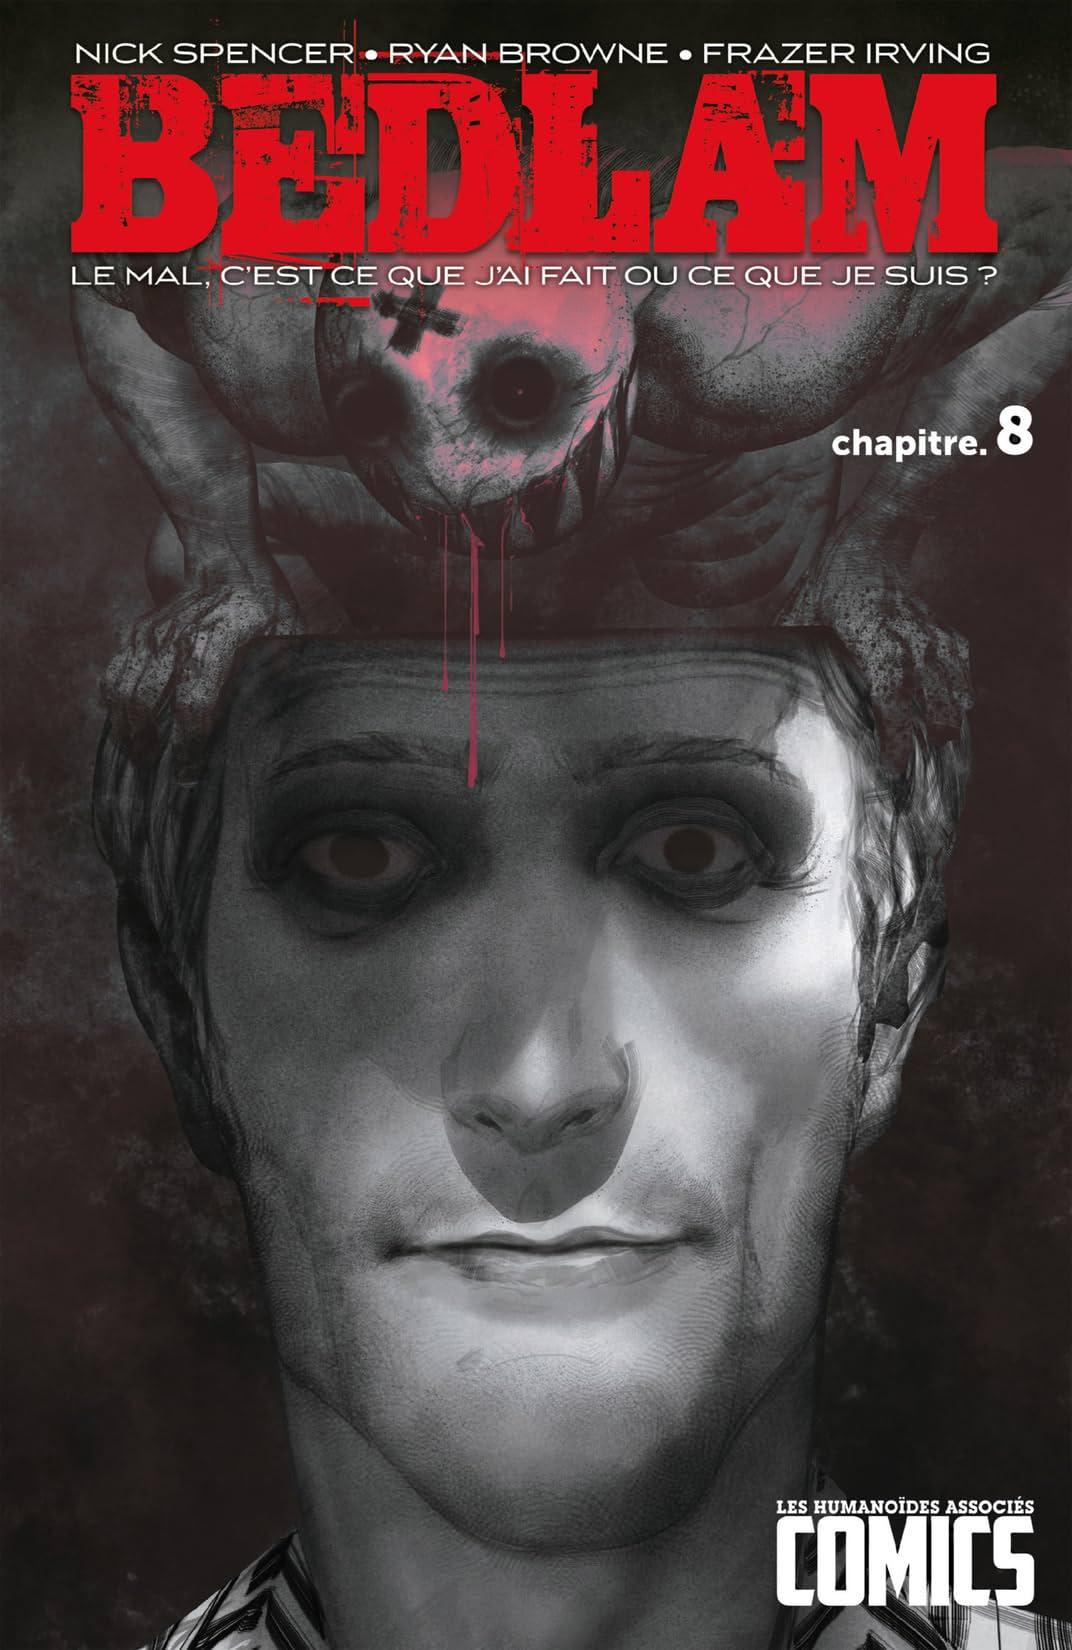 Bedlam: Chapitre 8